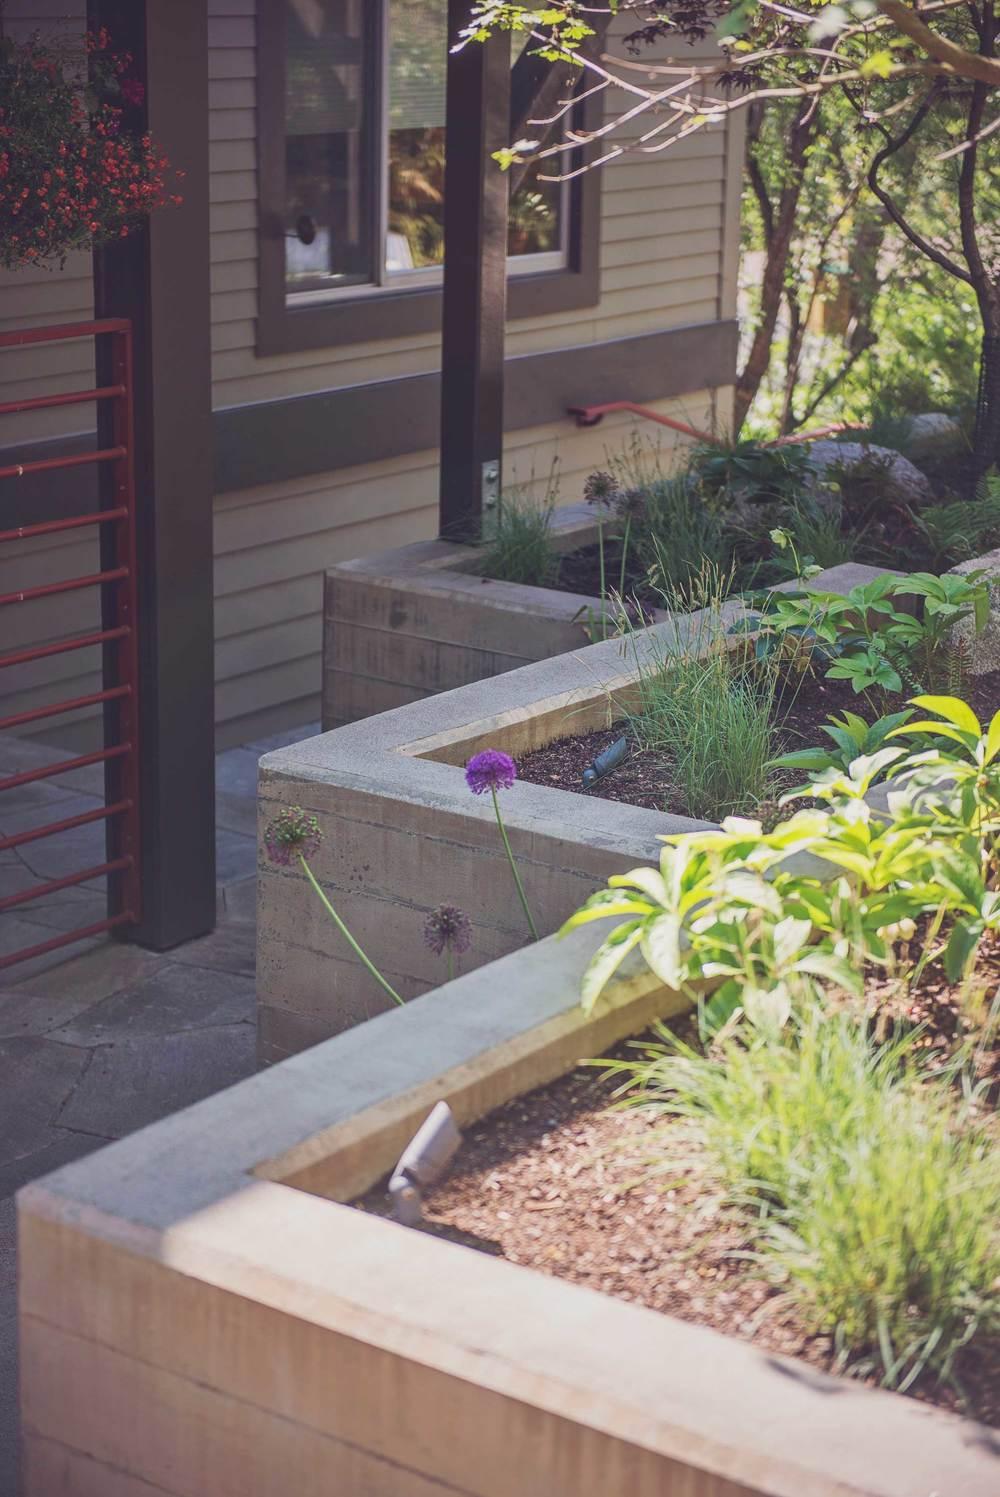 Custom Landscape Design to Match Building Architecture with Modern Landscape Lighting.jpg